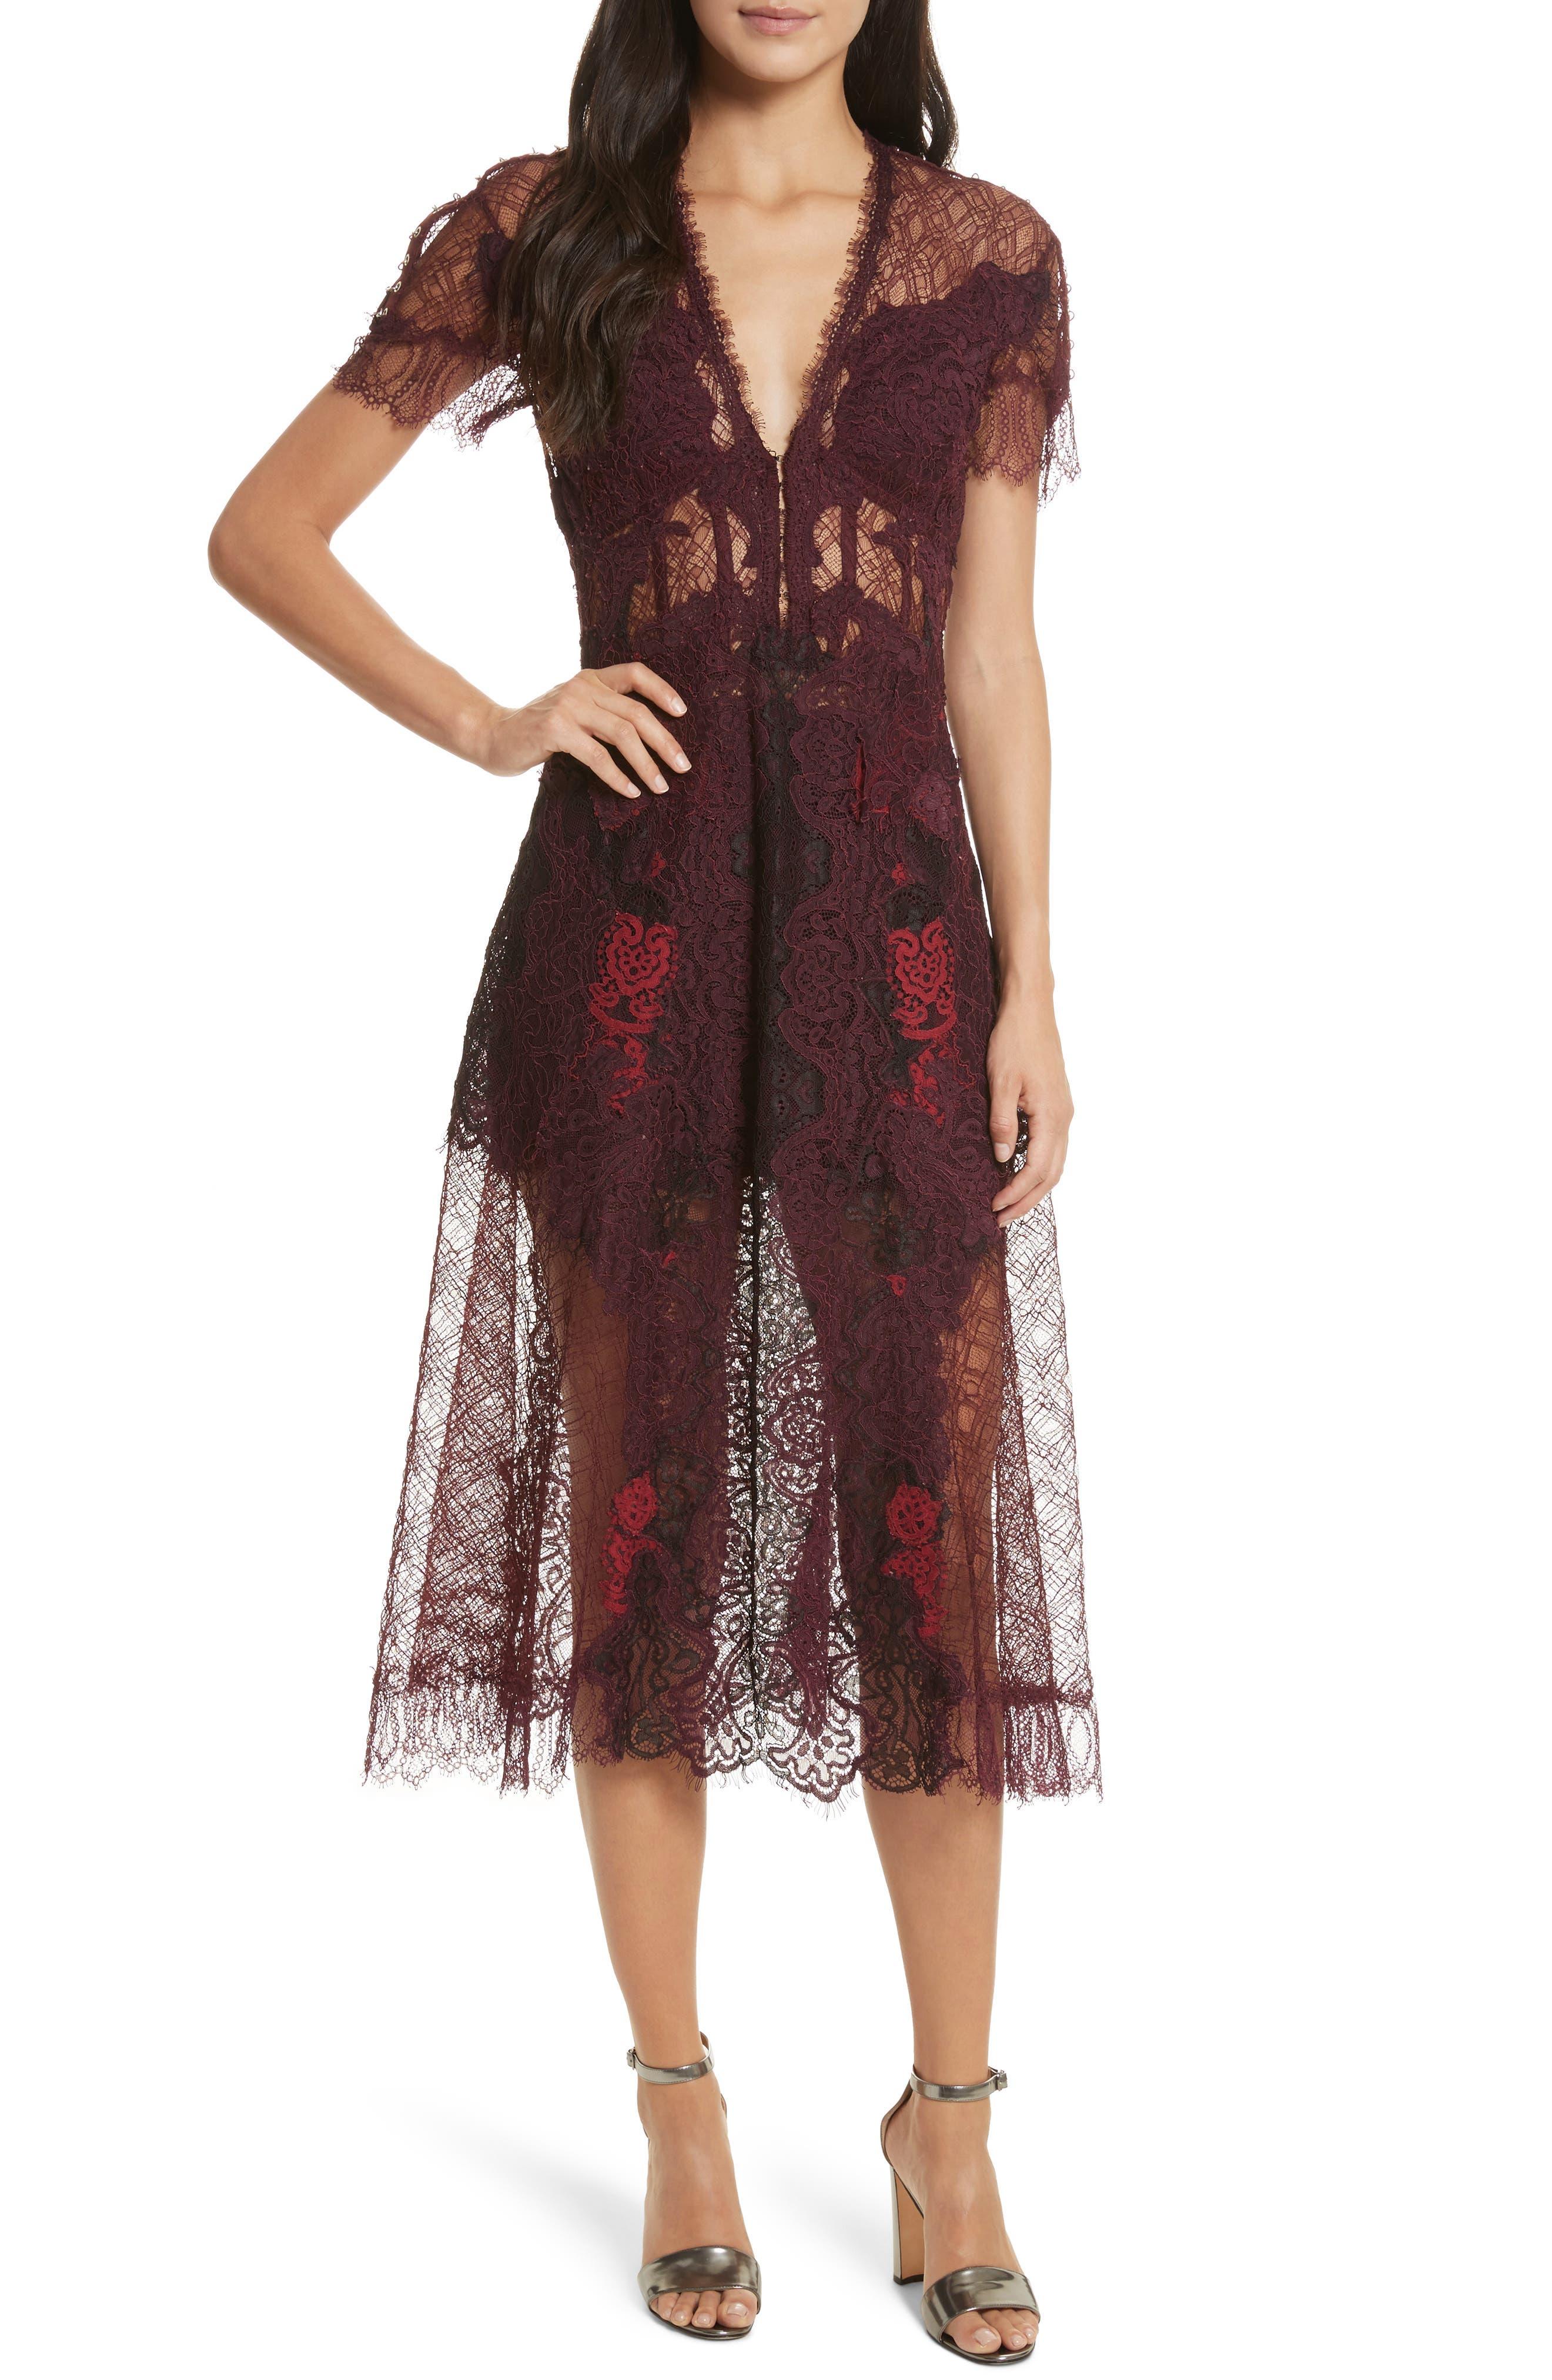 Jonathan Simkhai Grommet Detail Lace Dress